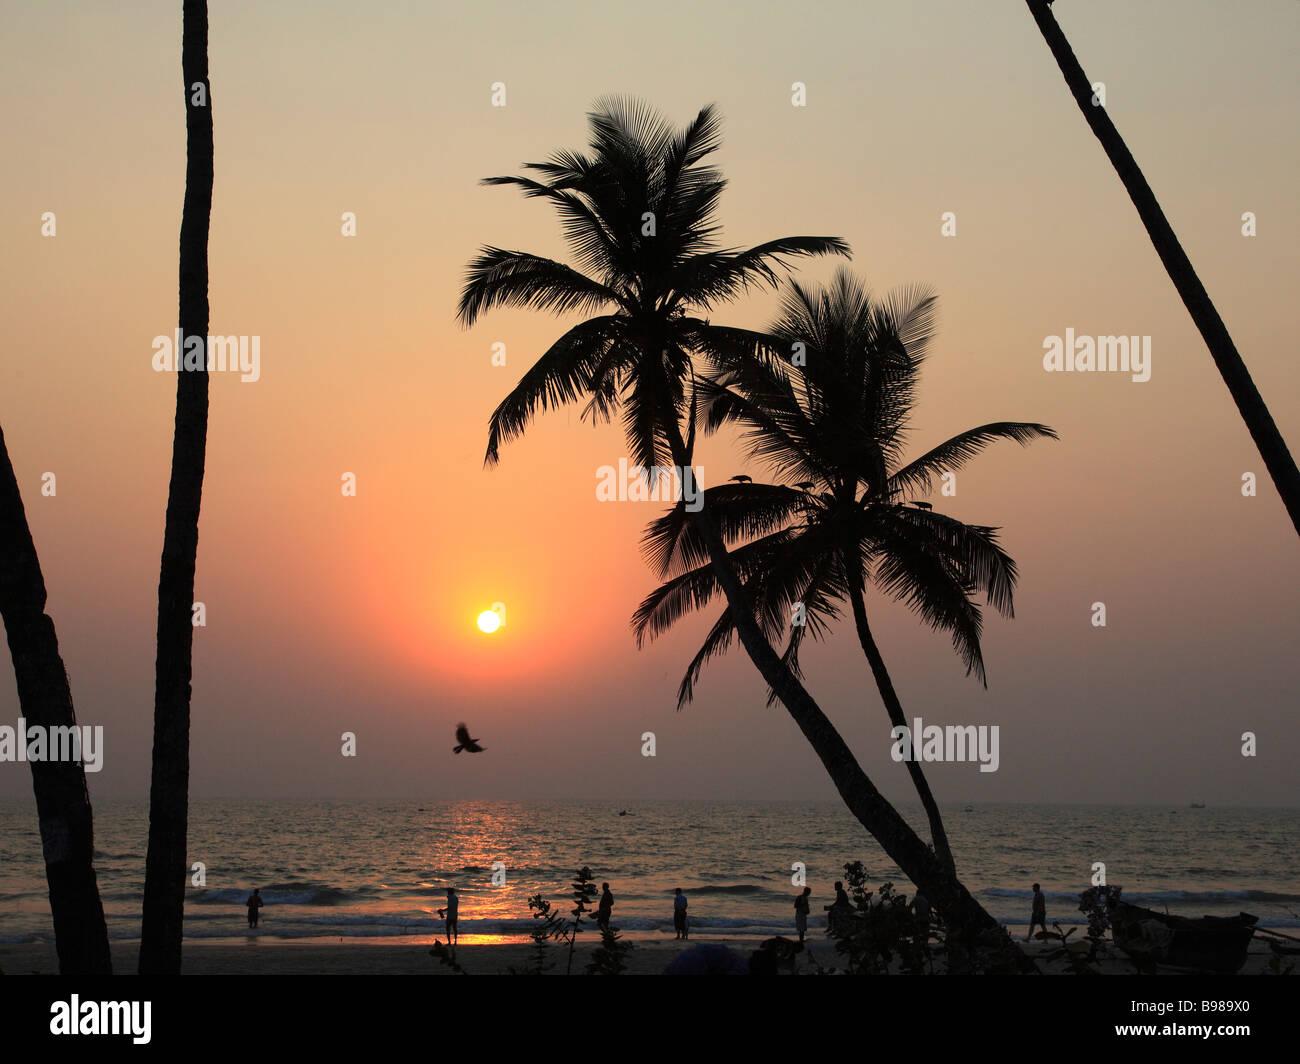 India Goa Colva beach coconut palm grove sunset silhouette - Stock Image